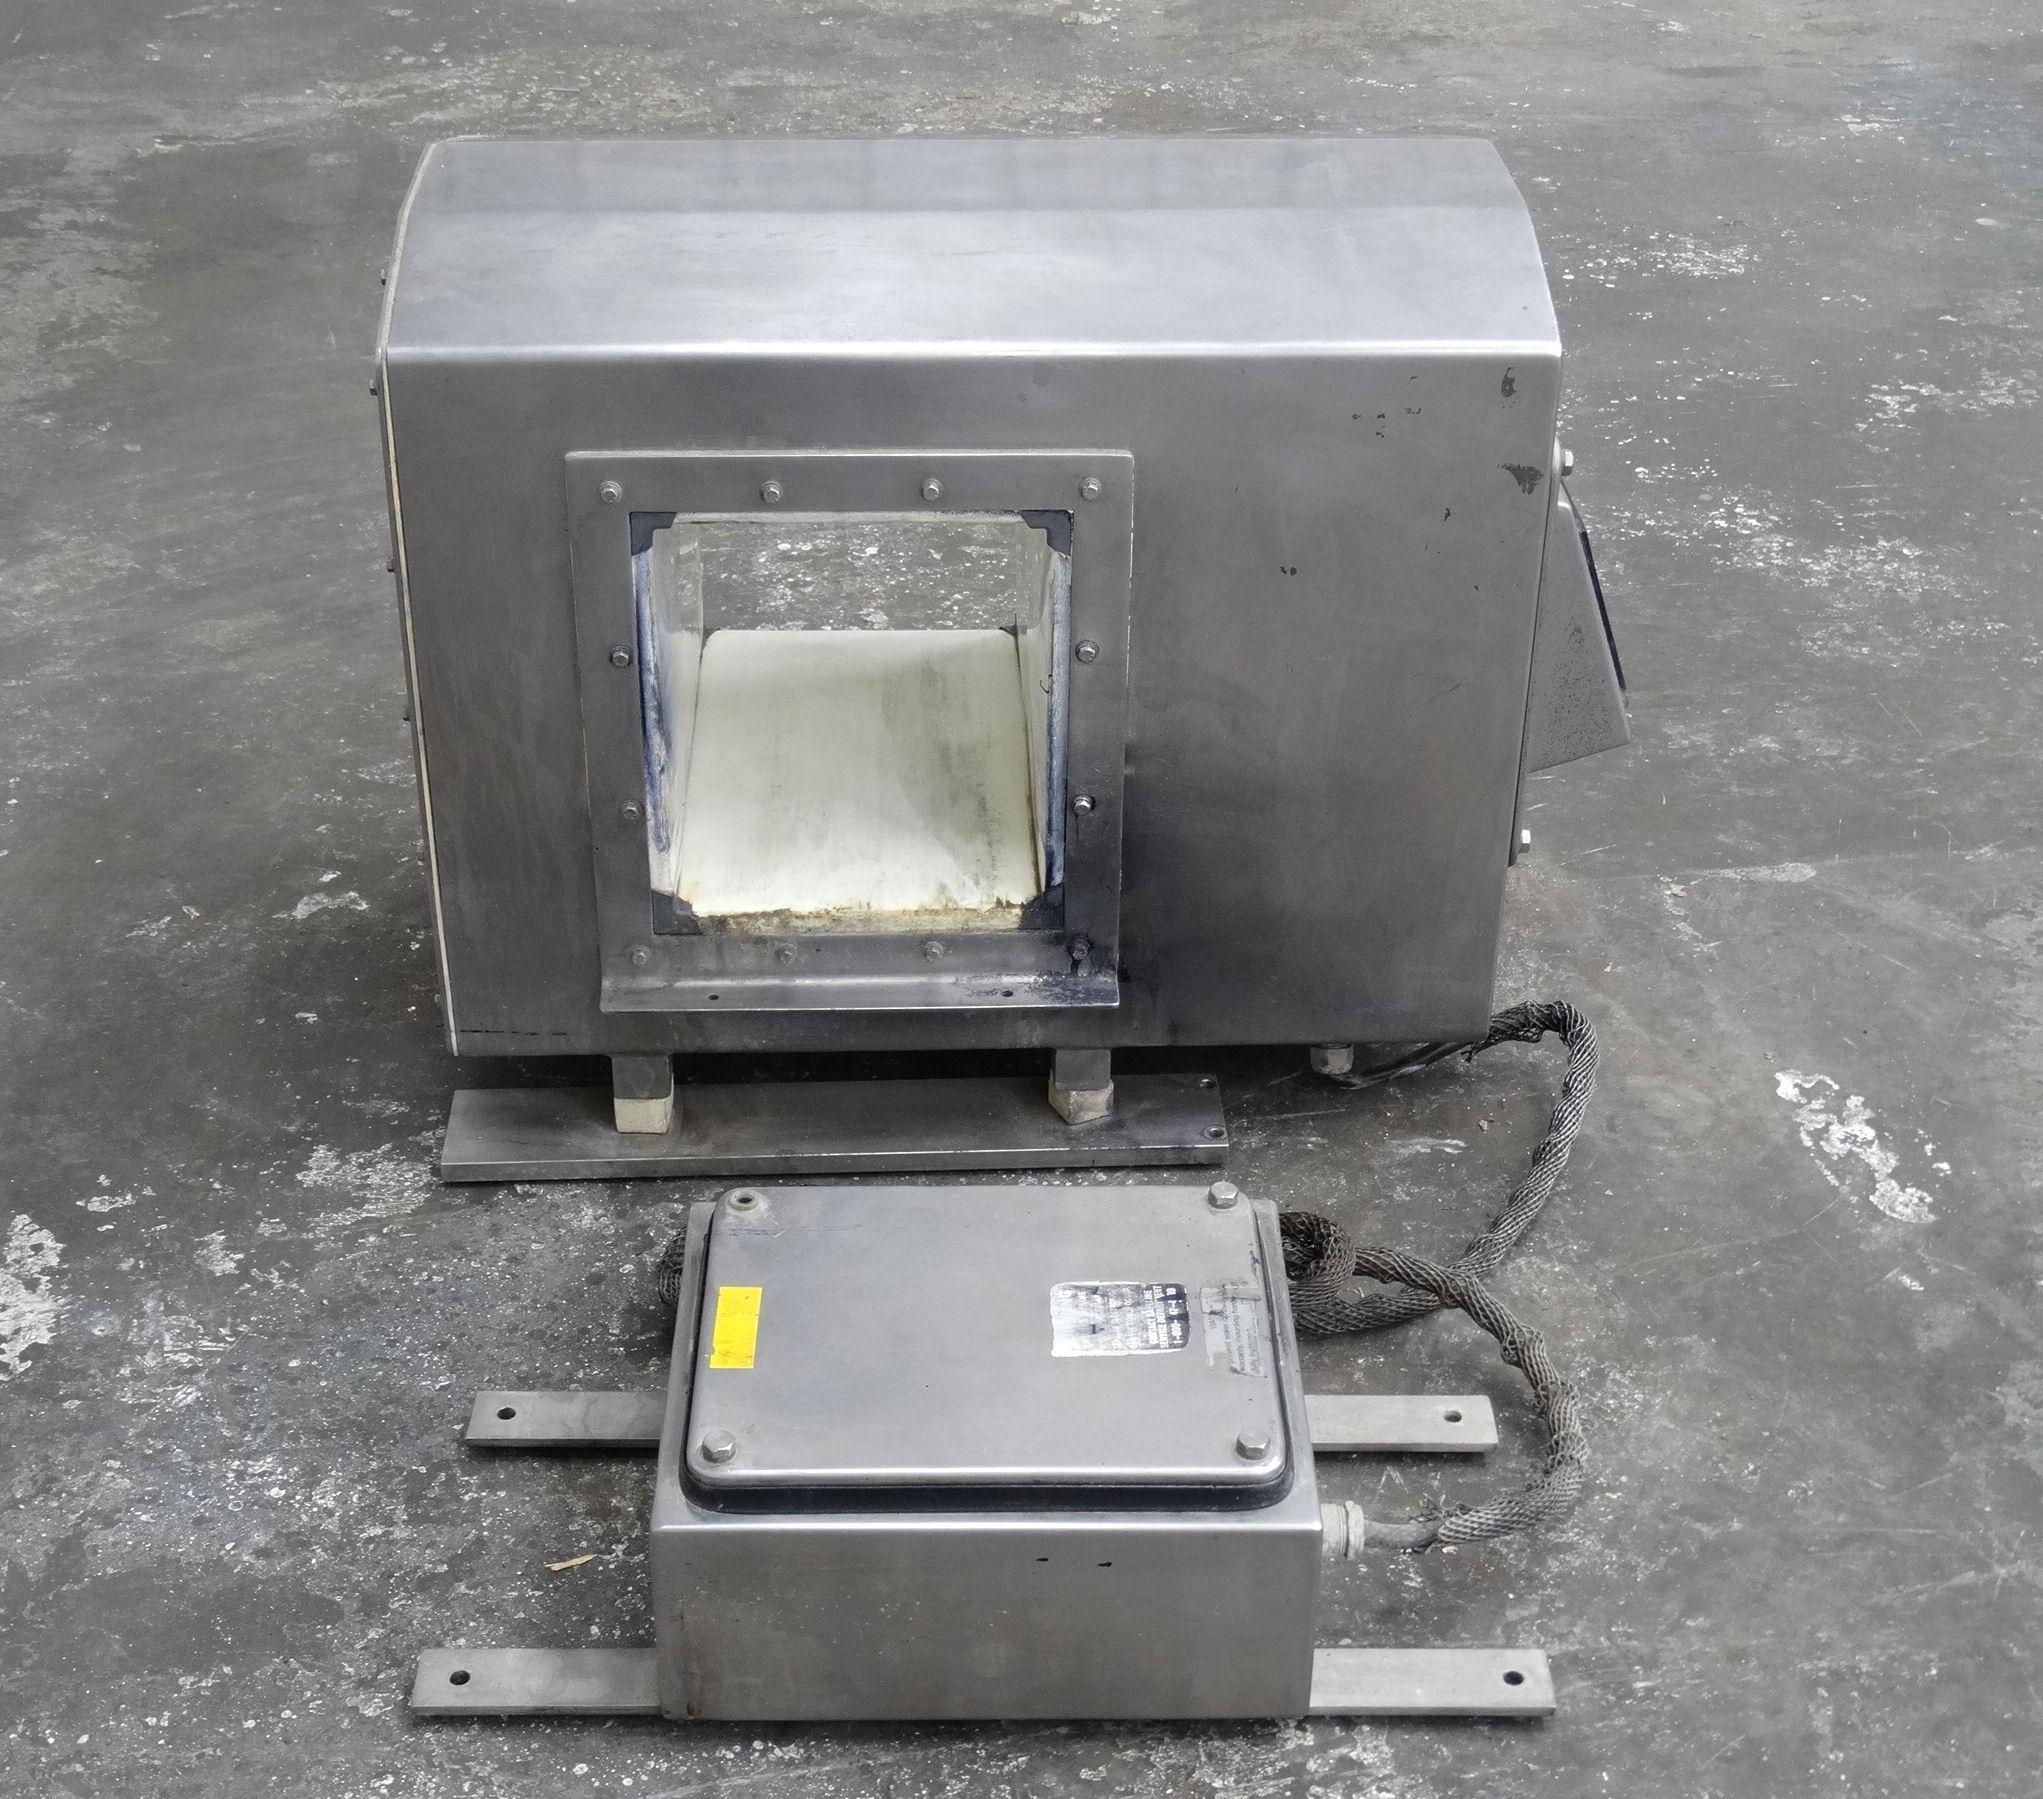 "Safeline Metal Detector Head 7.75""W x 7""H Opening B2157 - Image 5 of 8"